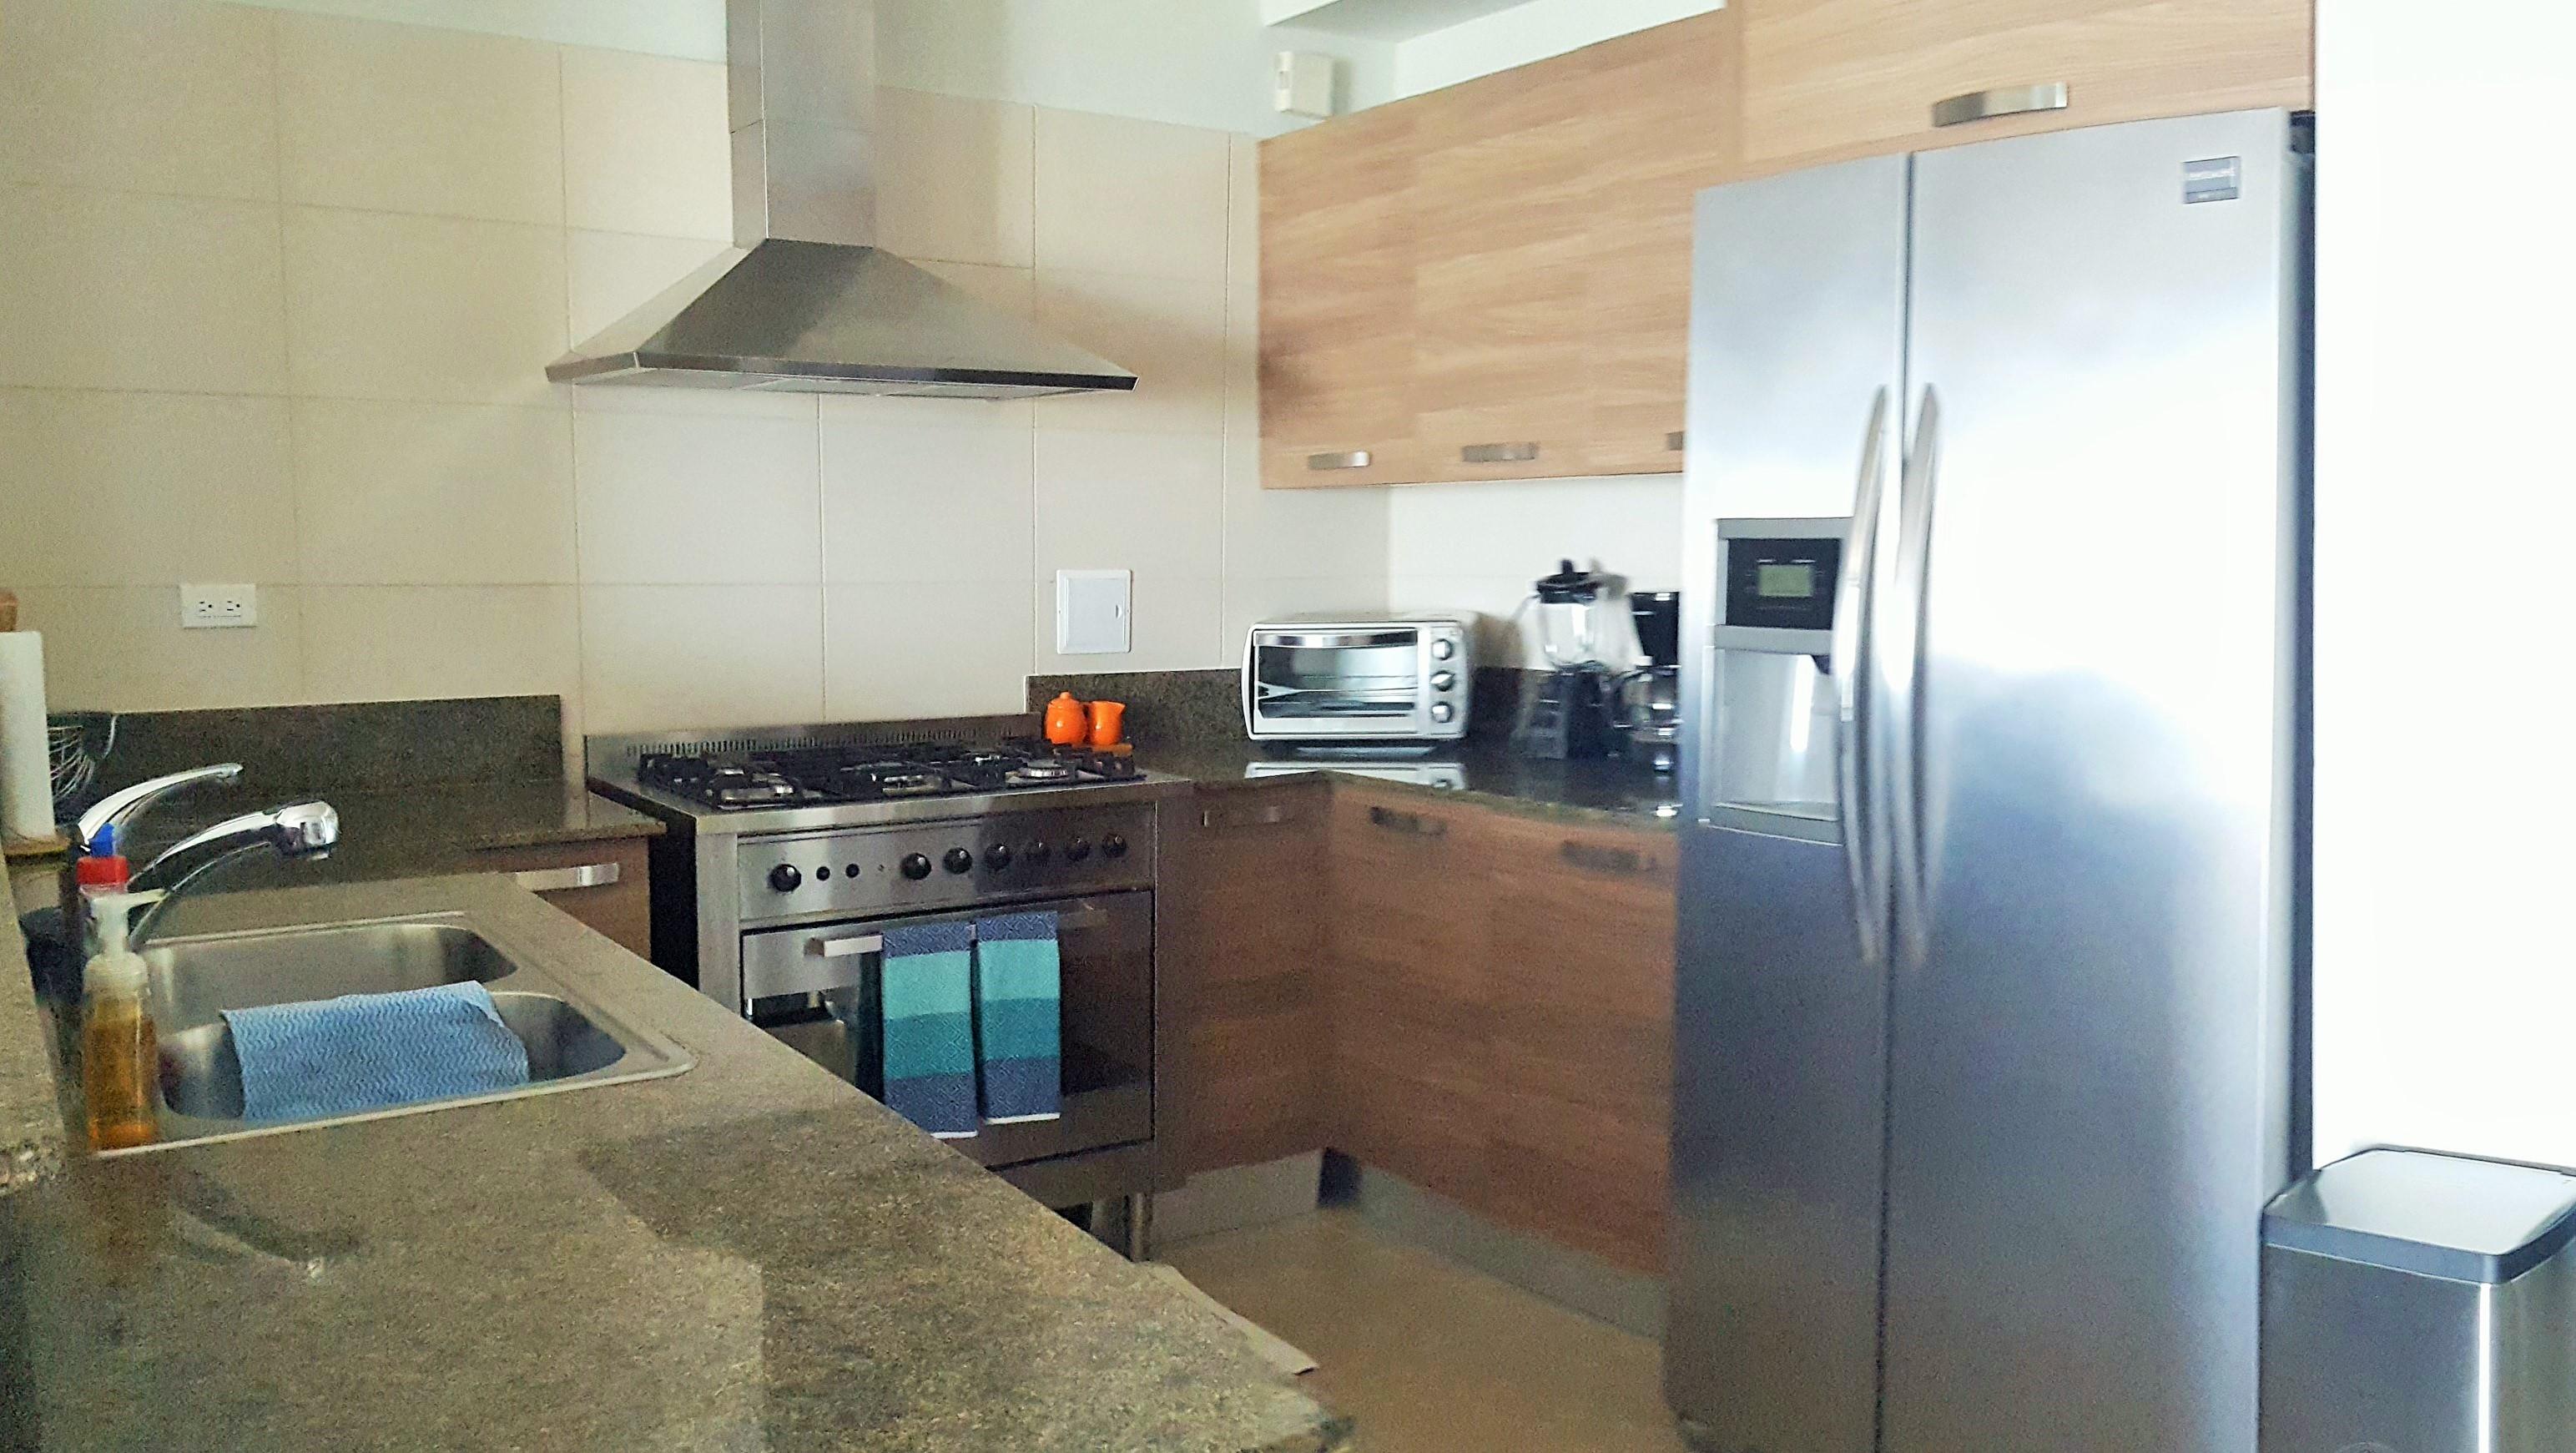 Rio-Mar-Panama-property-panamaequityvilla-del-rio-turn-key-move-in-ready-at-rio-mar-2.jpg